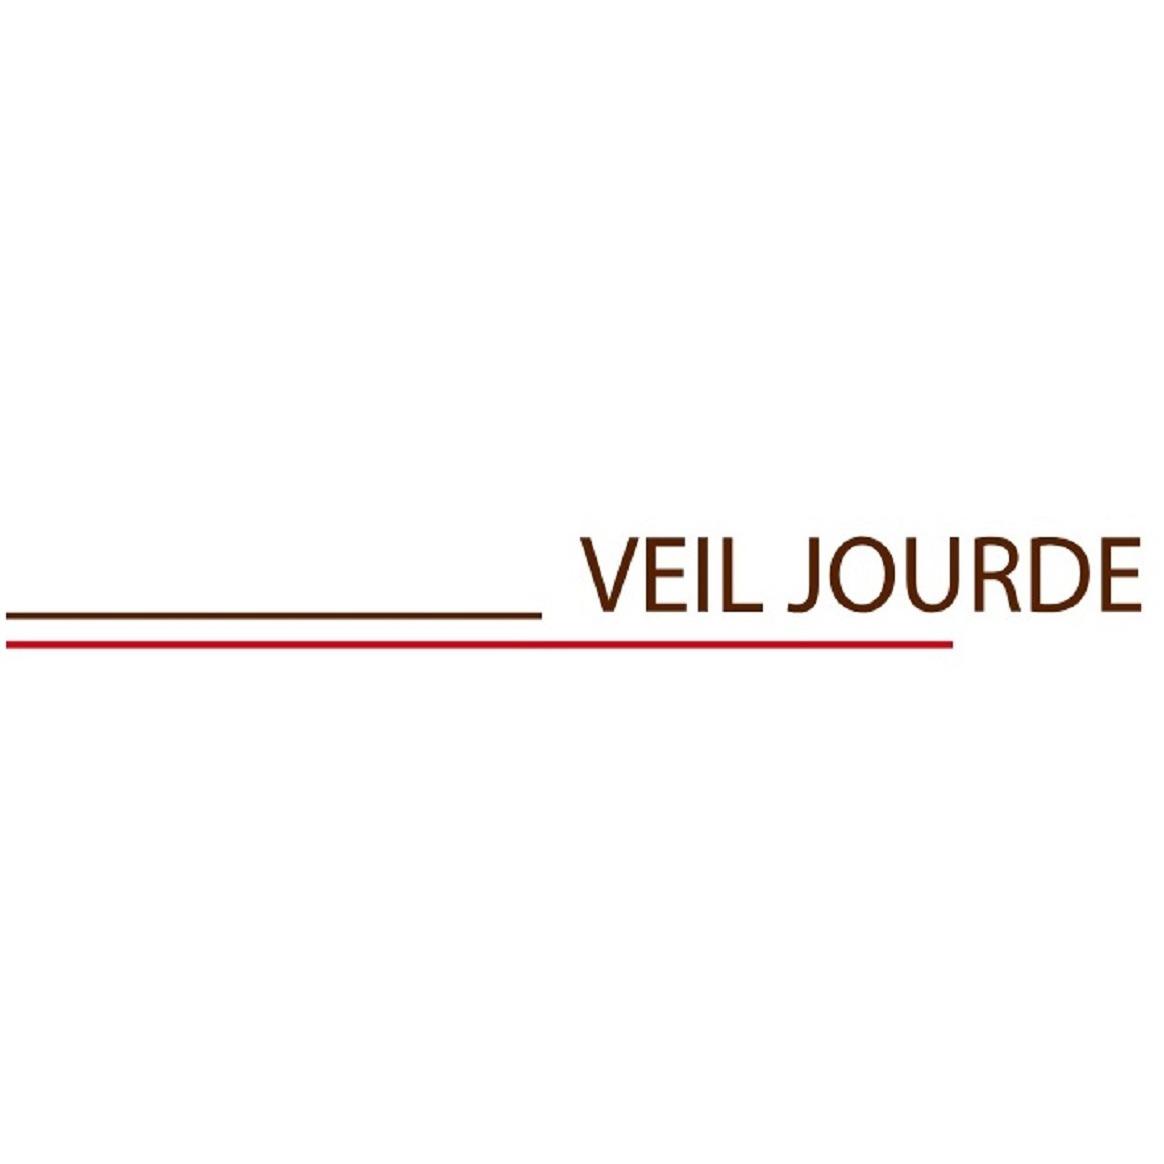 the Veil Jourde logo.